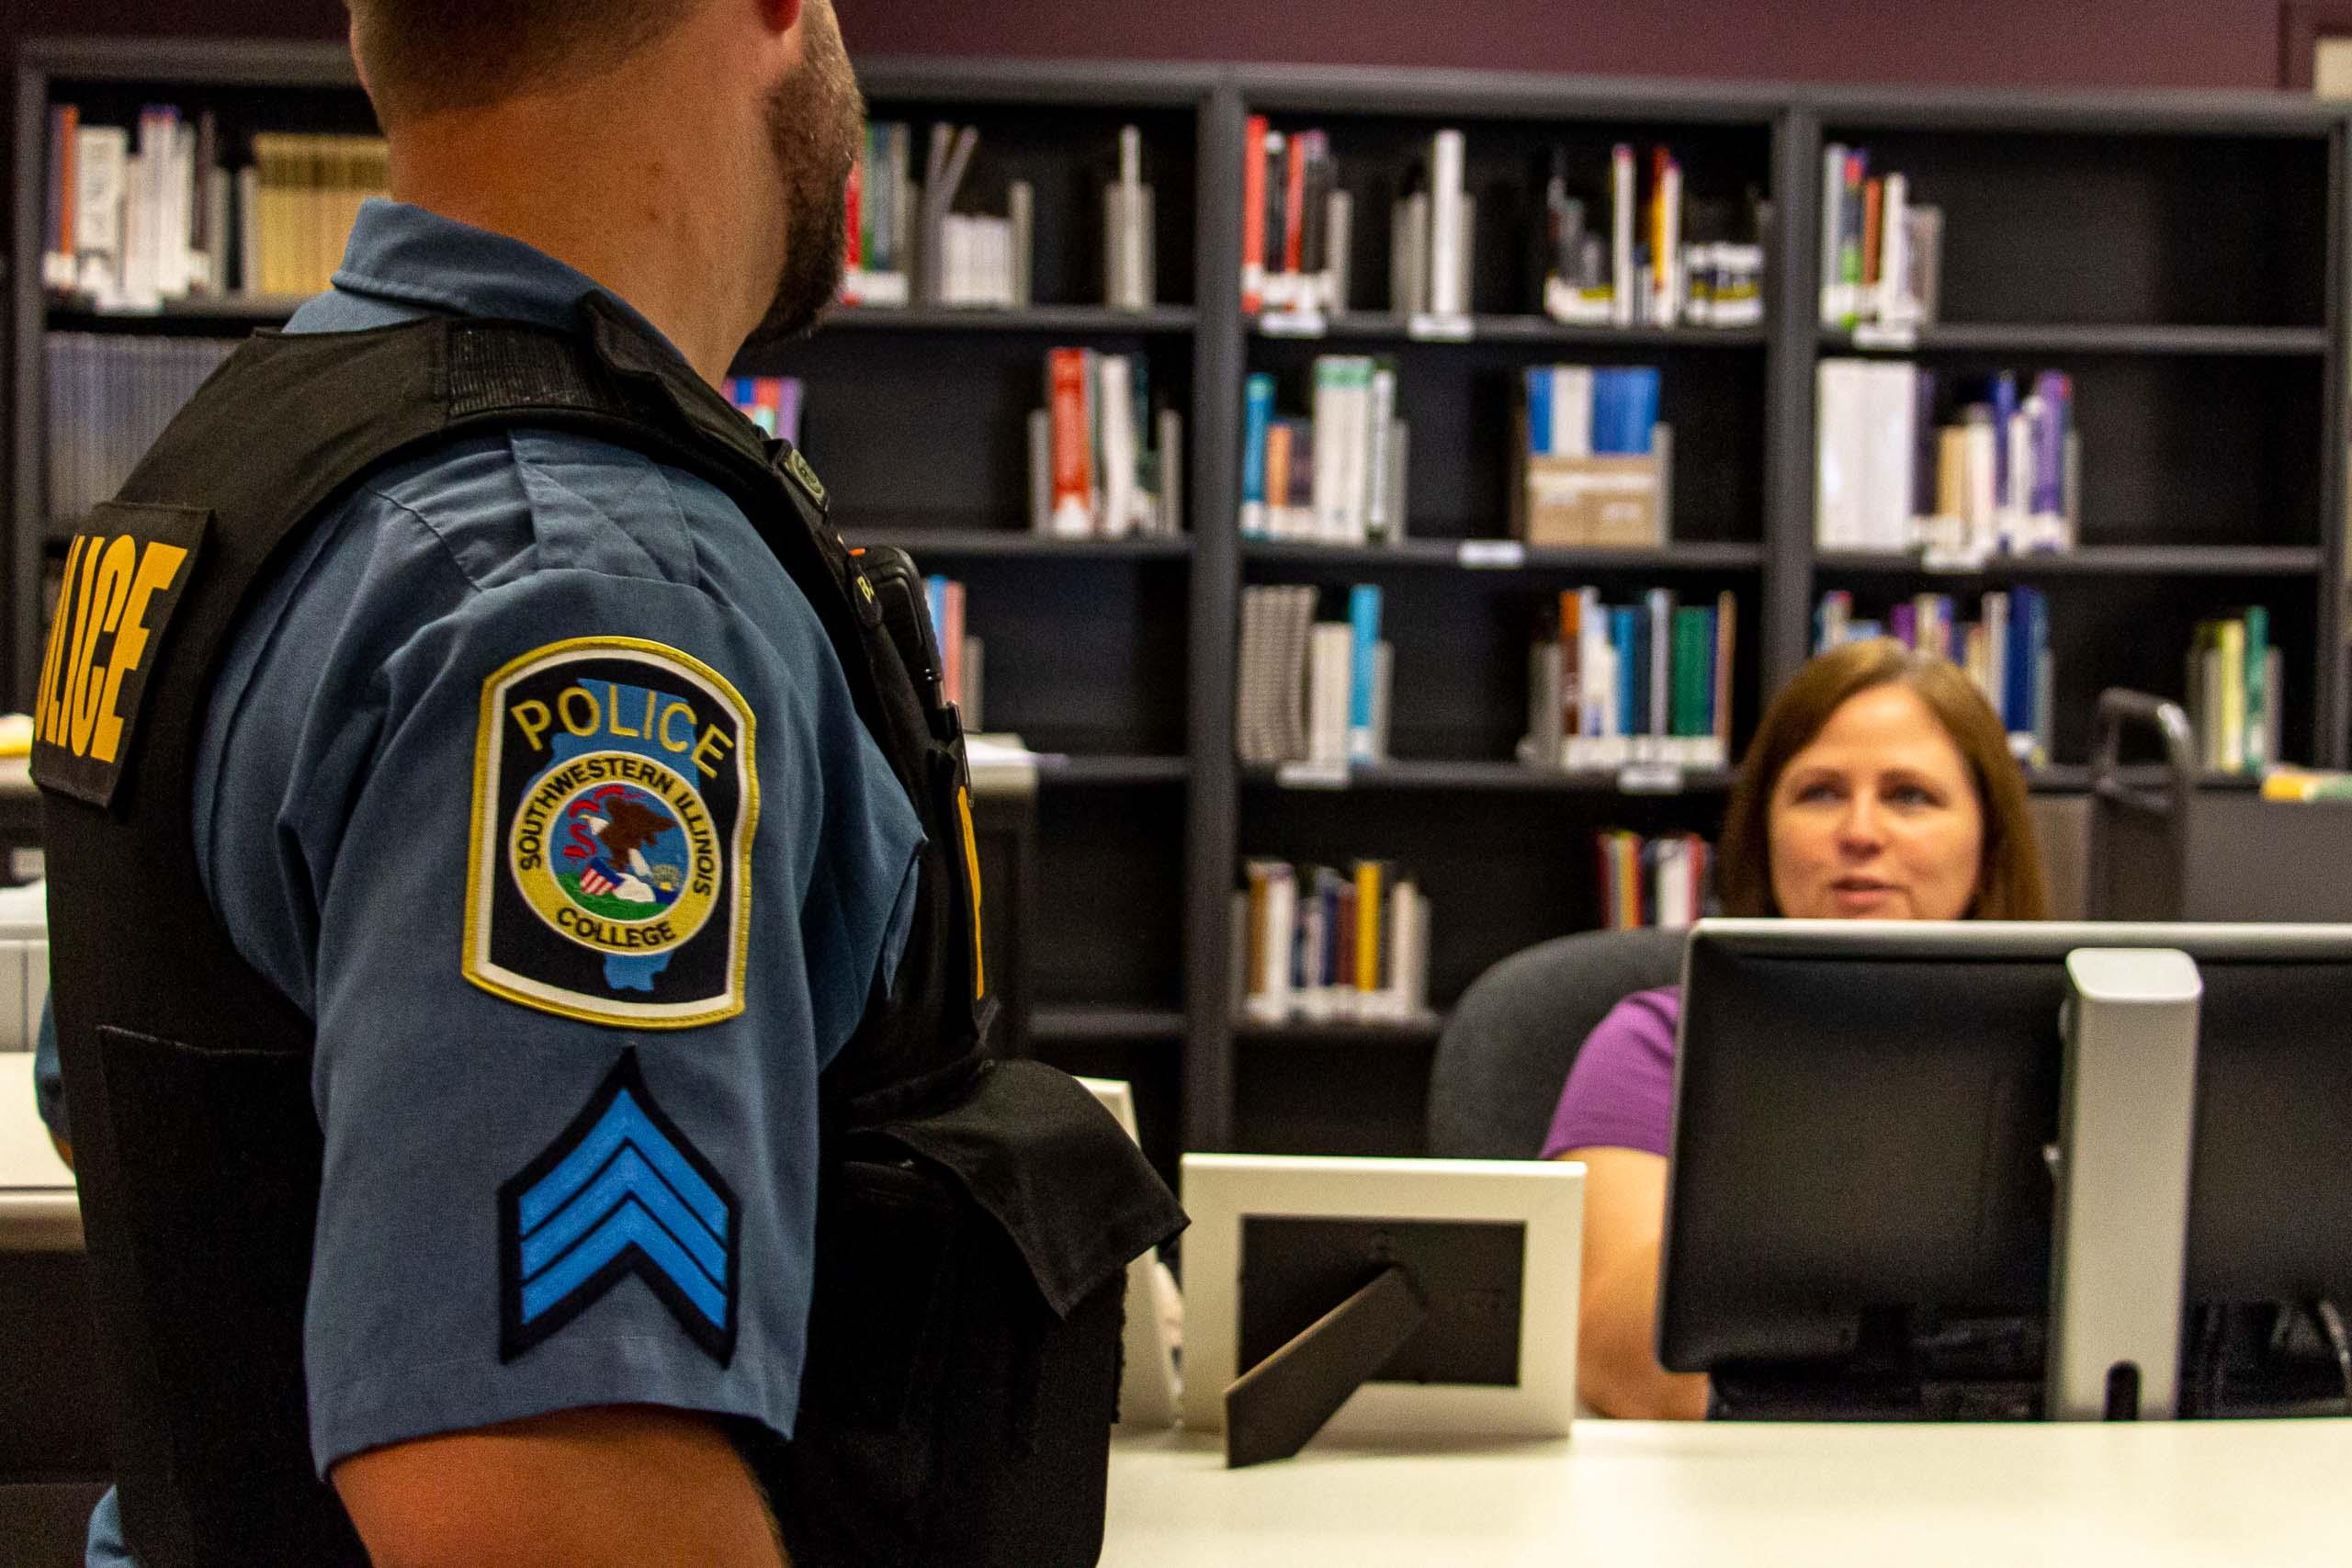 Officer speaking to staff.